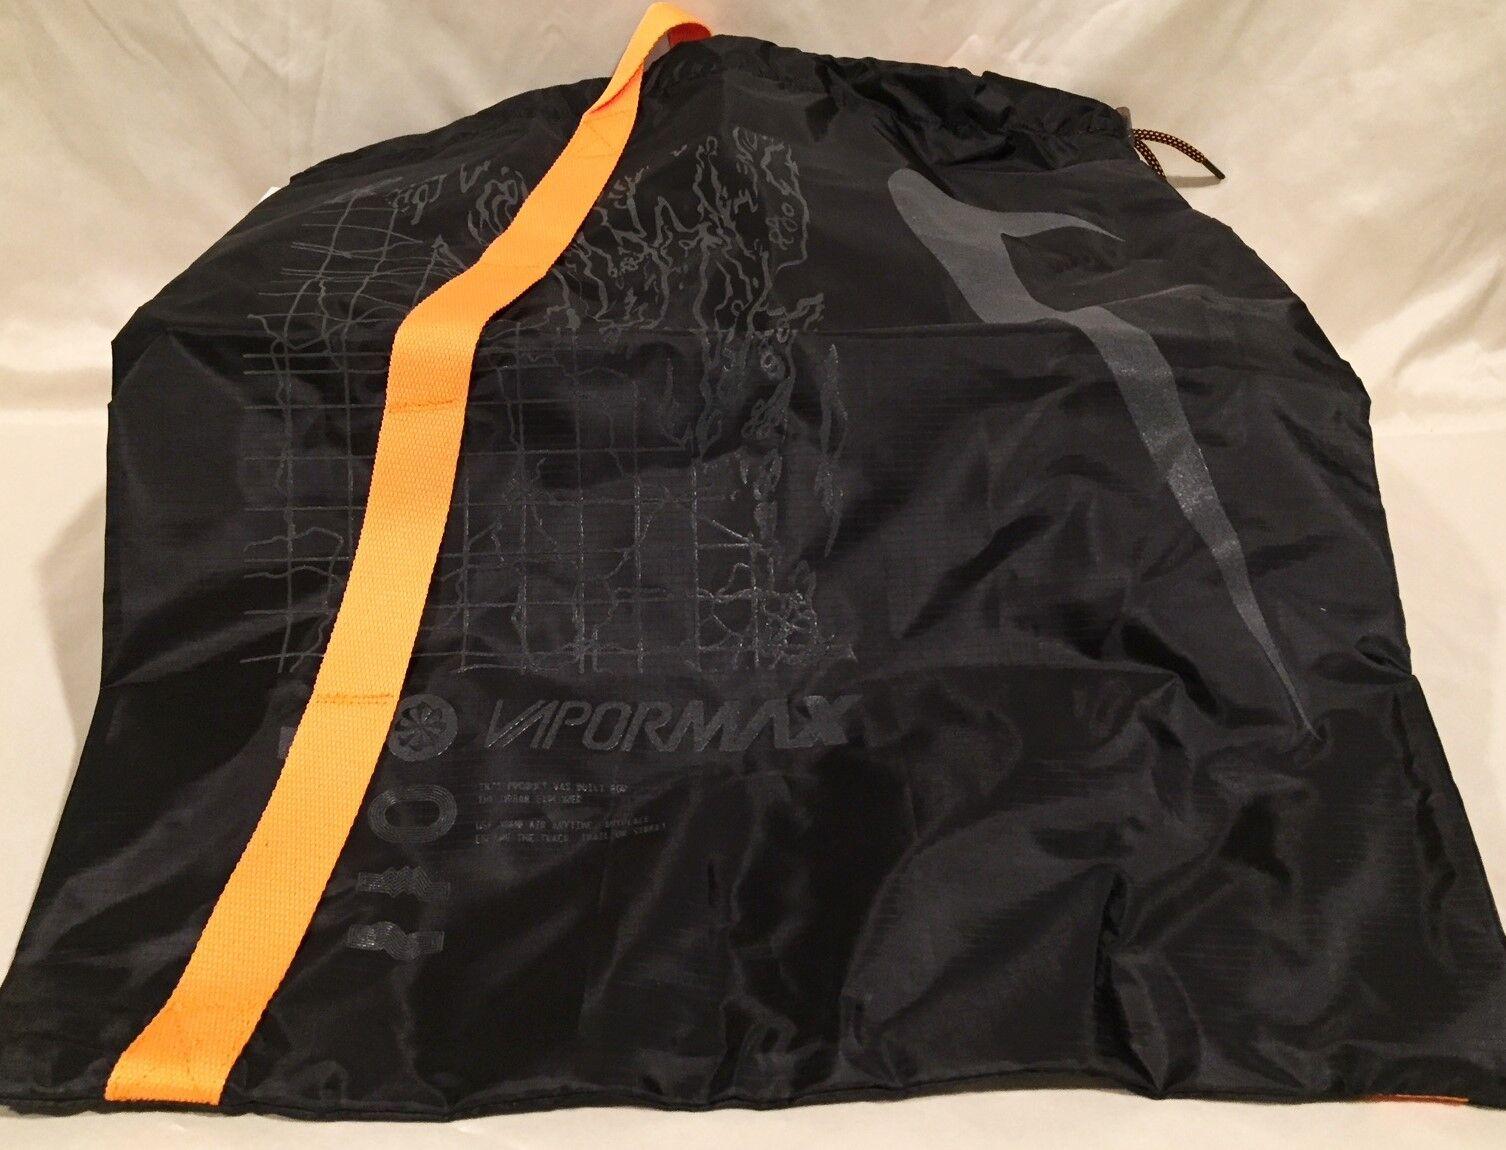 Neue nike air vapormax fk - utility - größe 8 - fk schwarz / orange peel - ah6834-008 573a8a